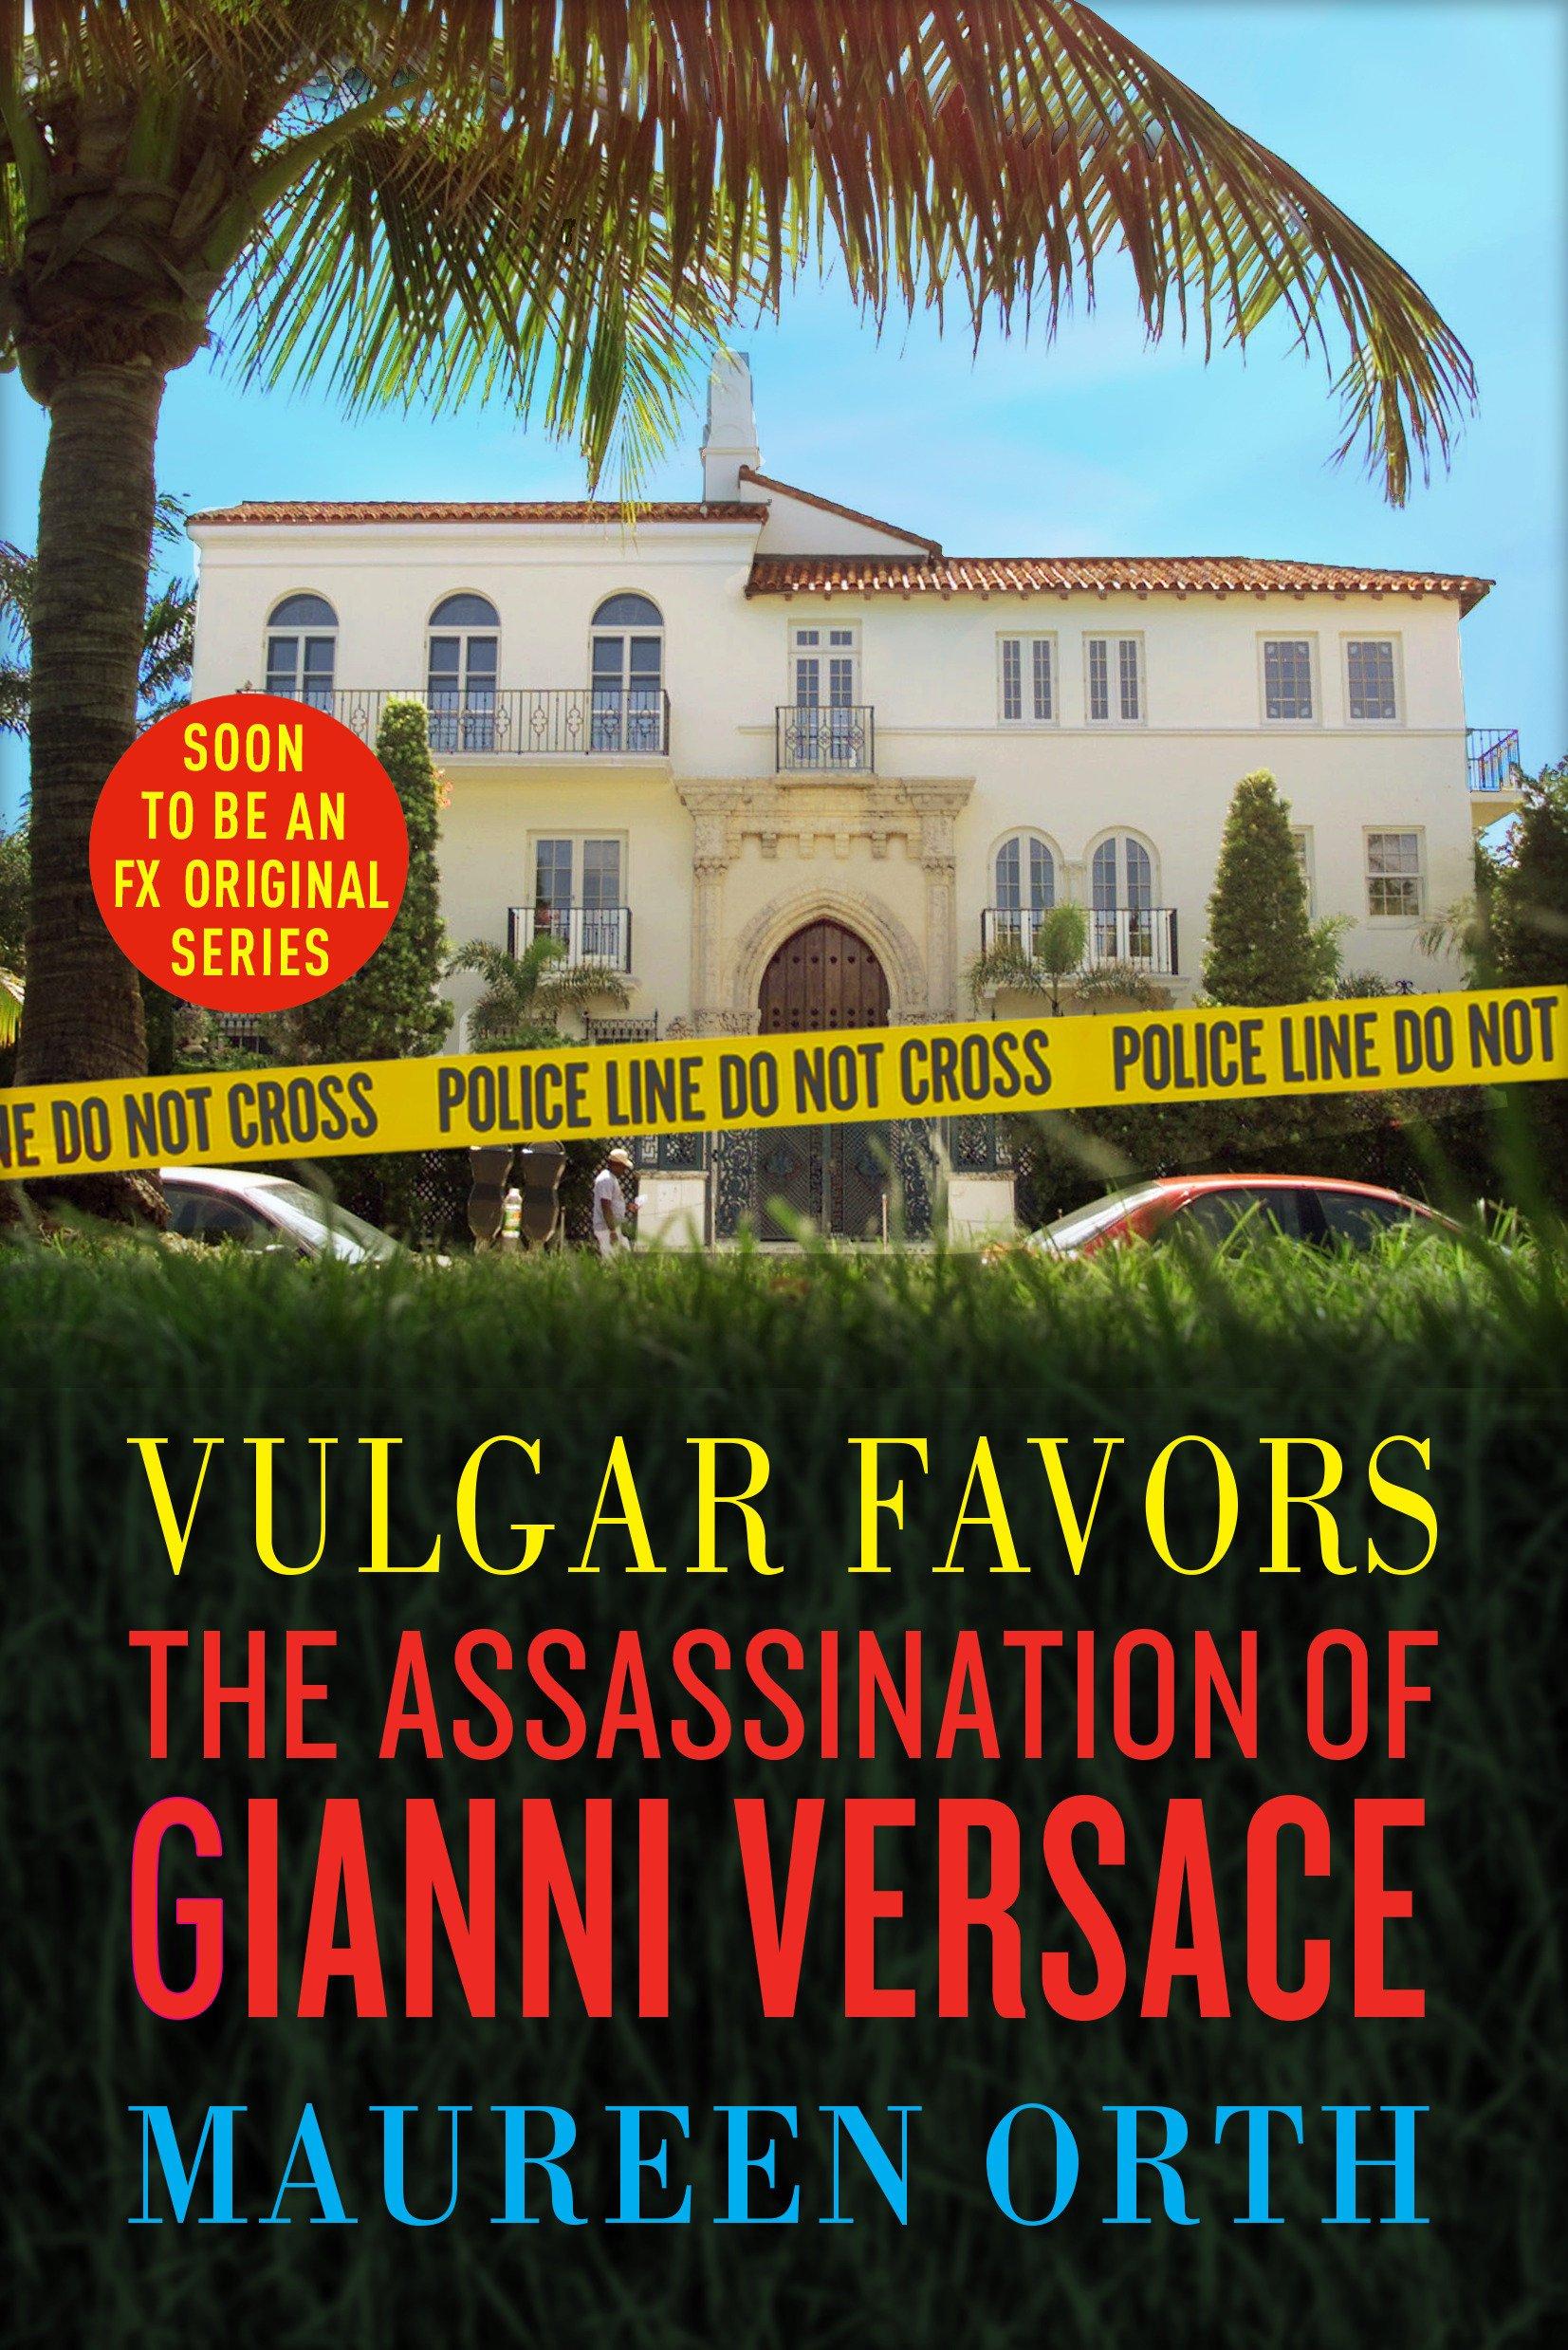 Vulgar Favors: The Assassination of Gianni Versace: Amazon.es: Maureen Orth: Libros en idiomas extranjeros